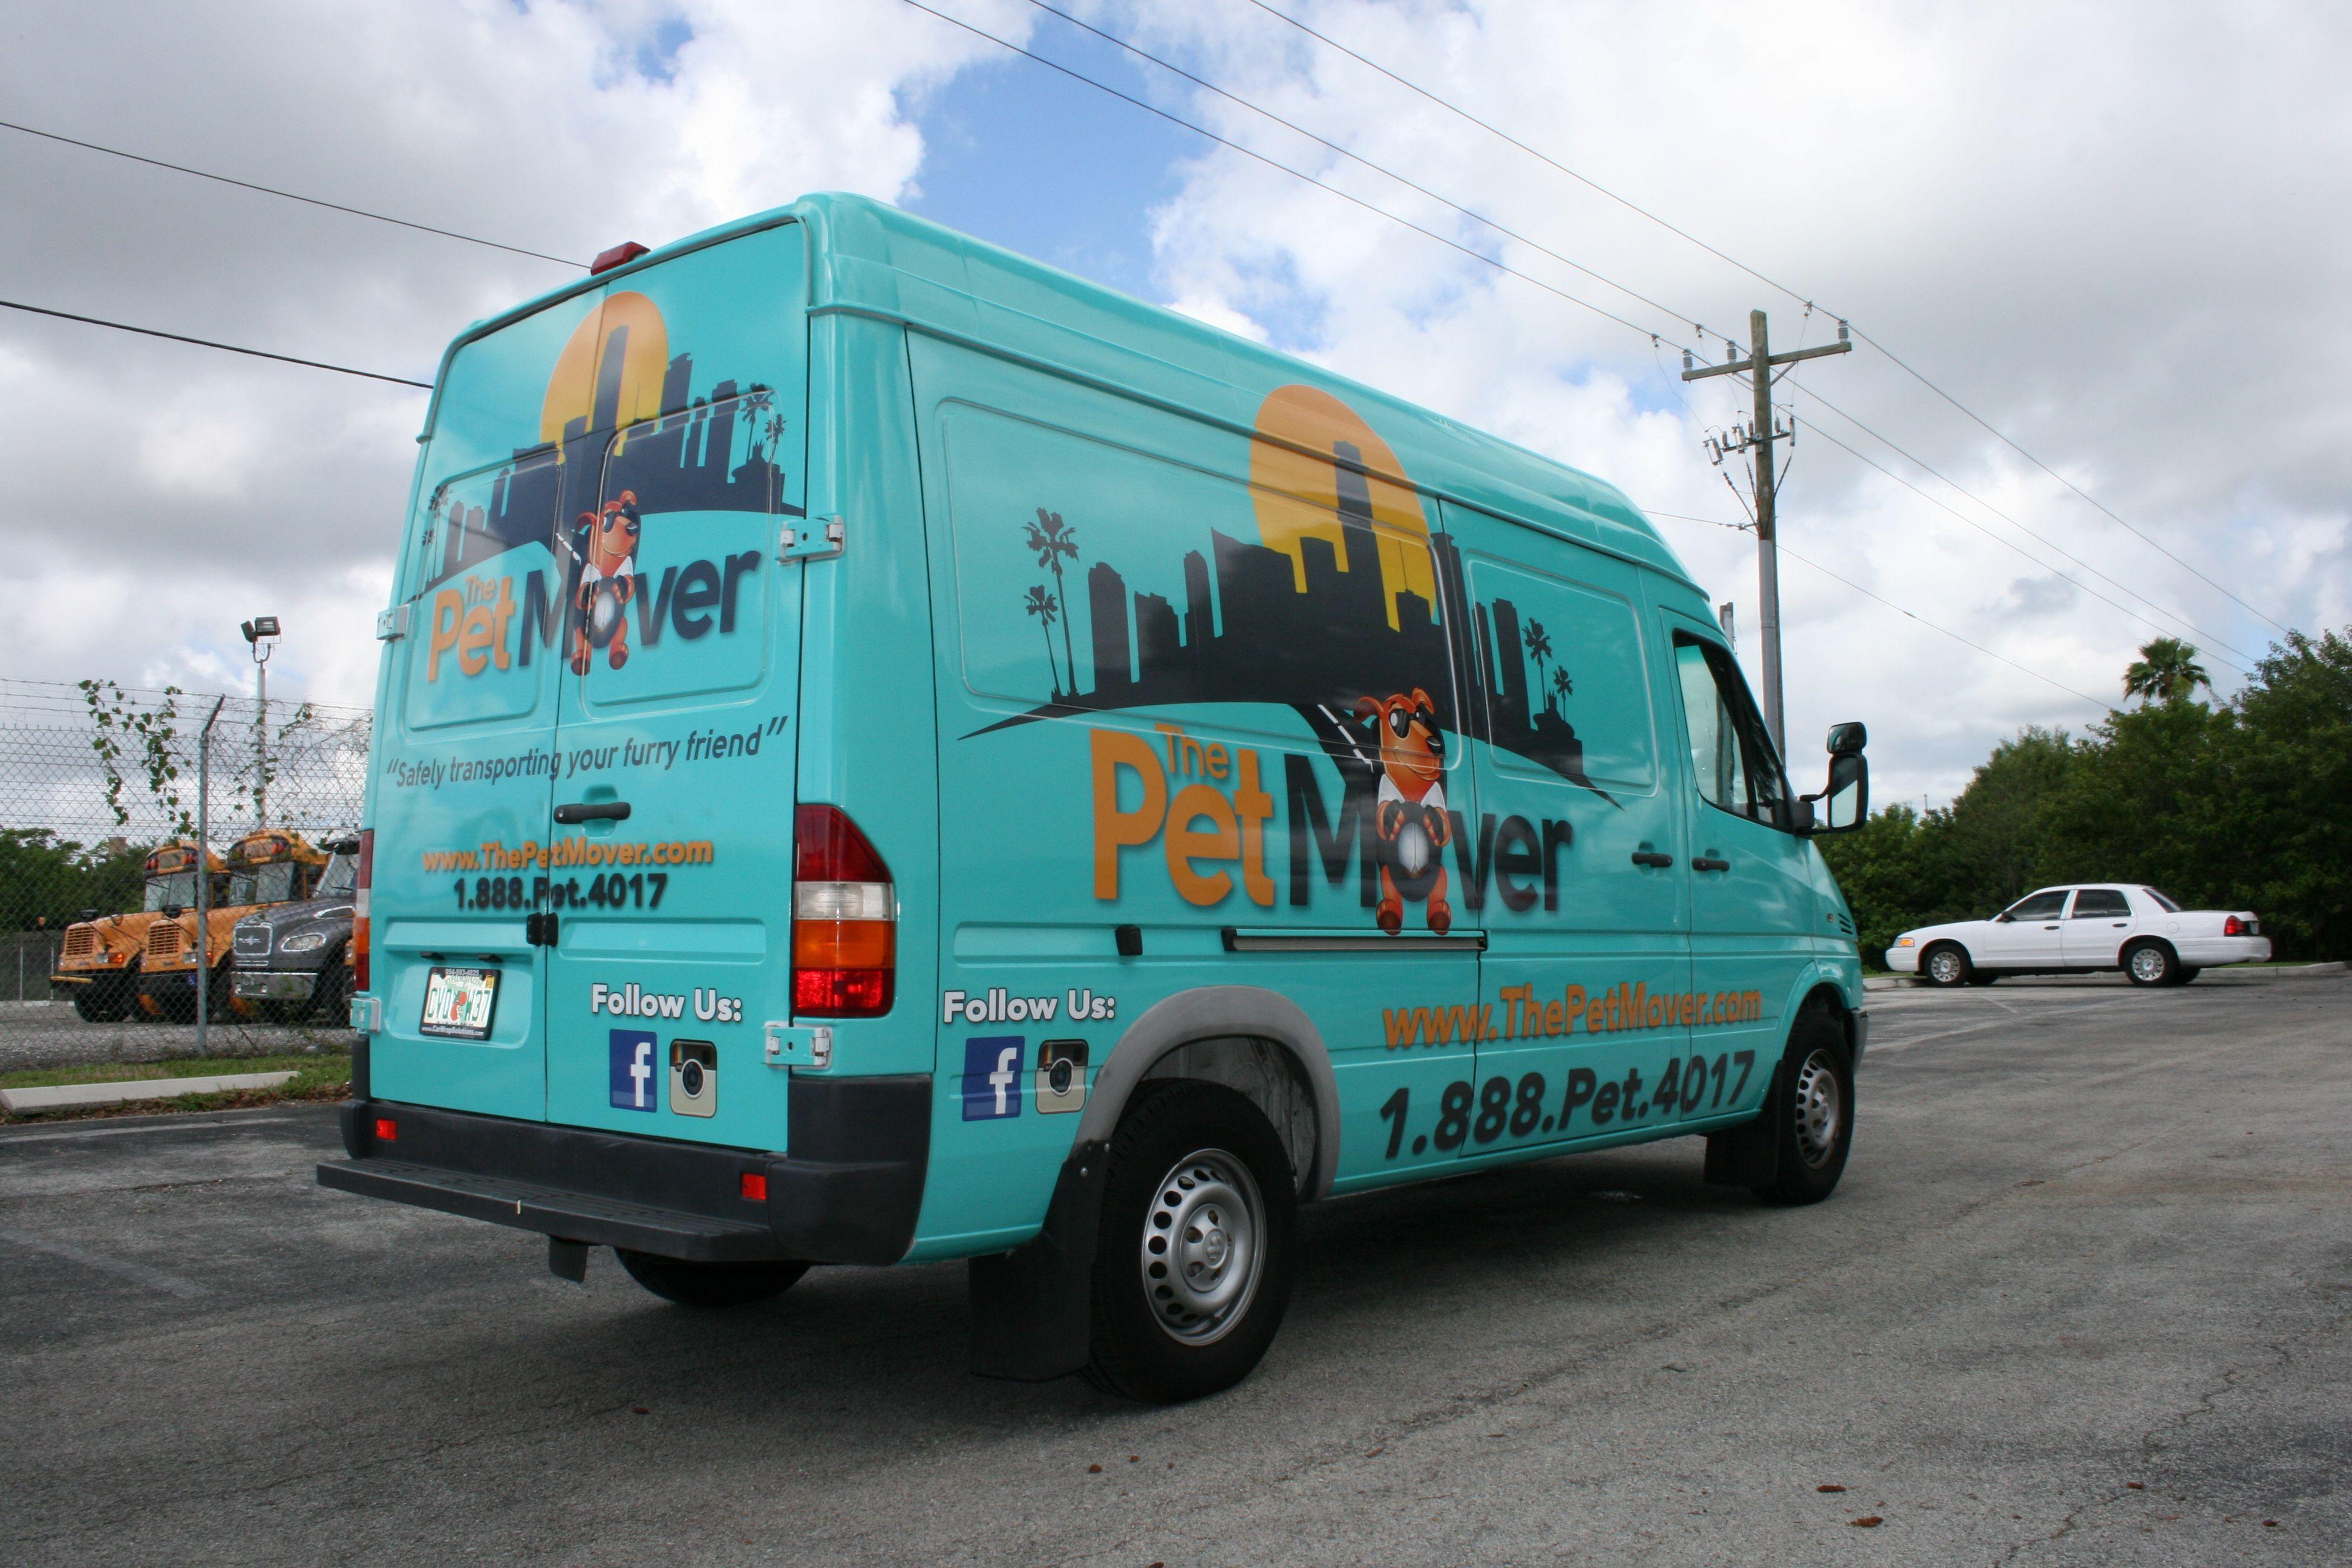 a46c7786b7 Sprinter van cargo van car wrap for Miami small business customer The Pet  Mover.